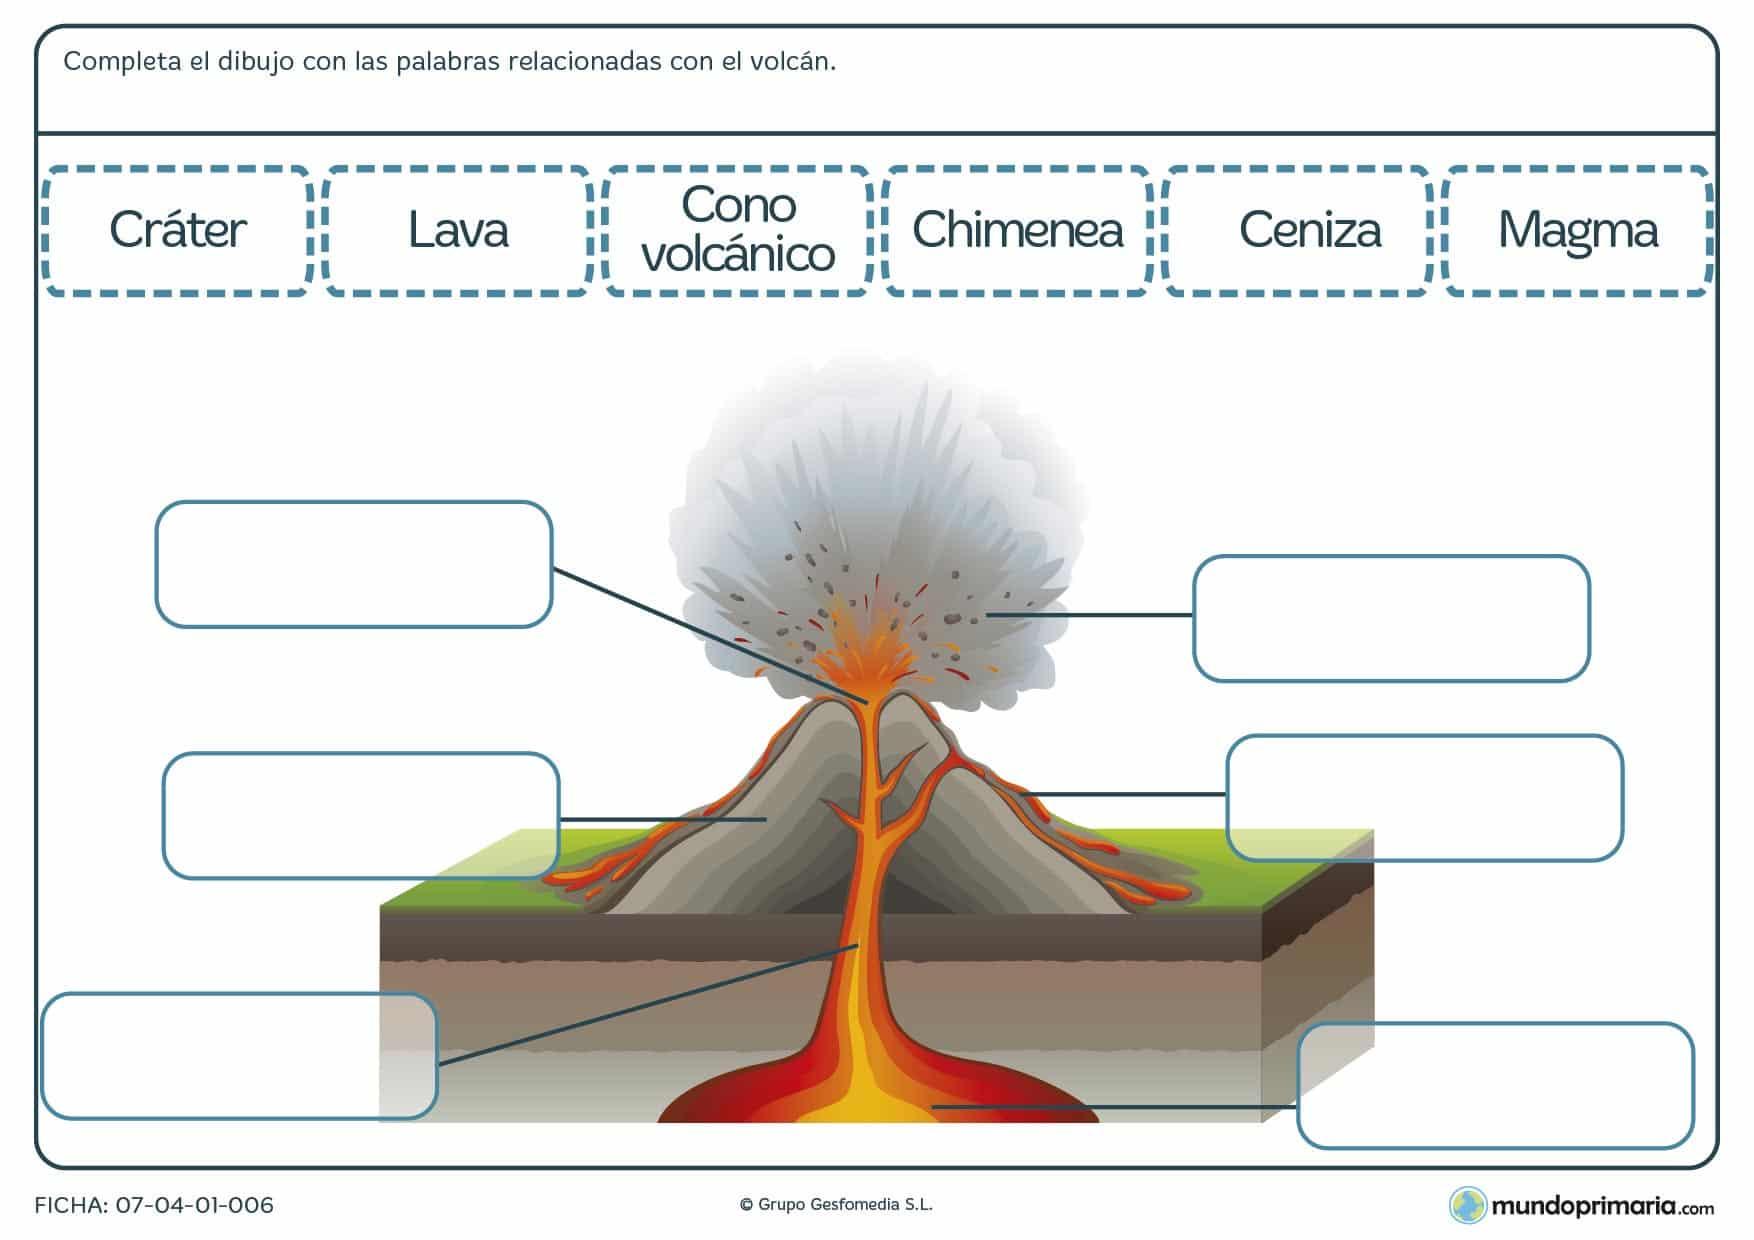 Ficha de un dibujo de un volcán para completar